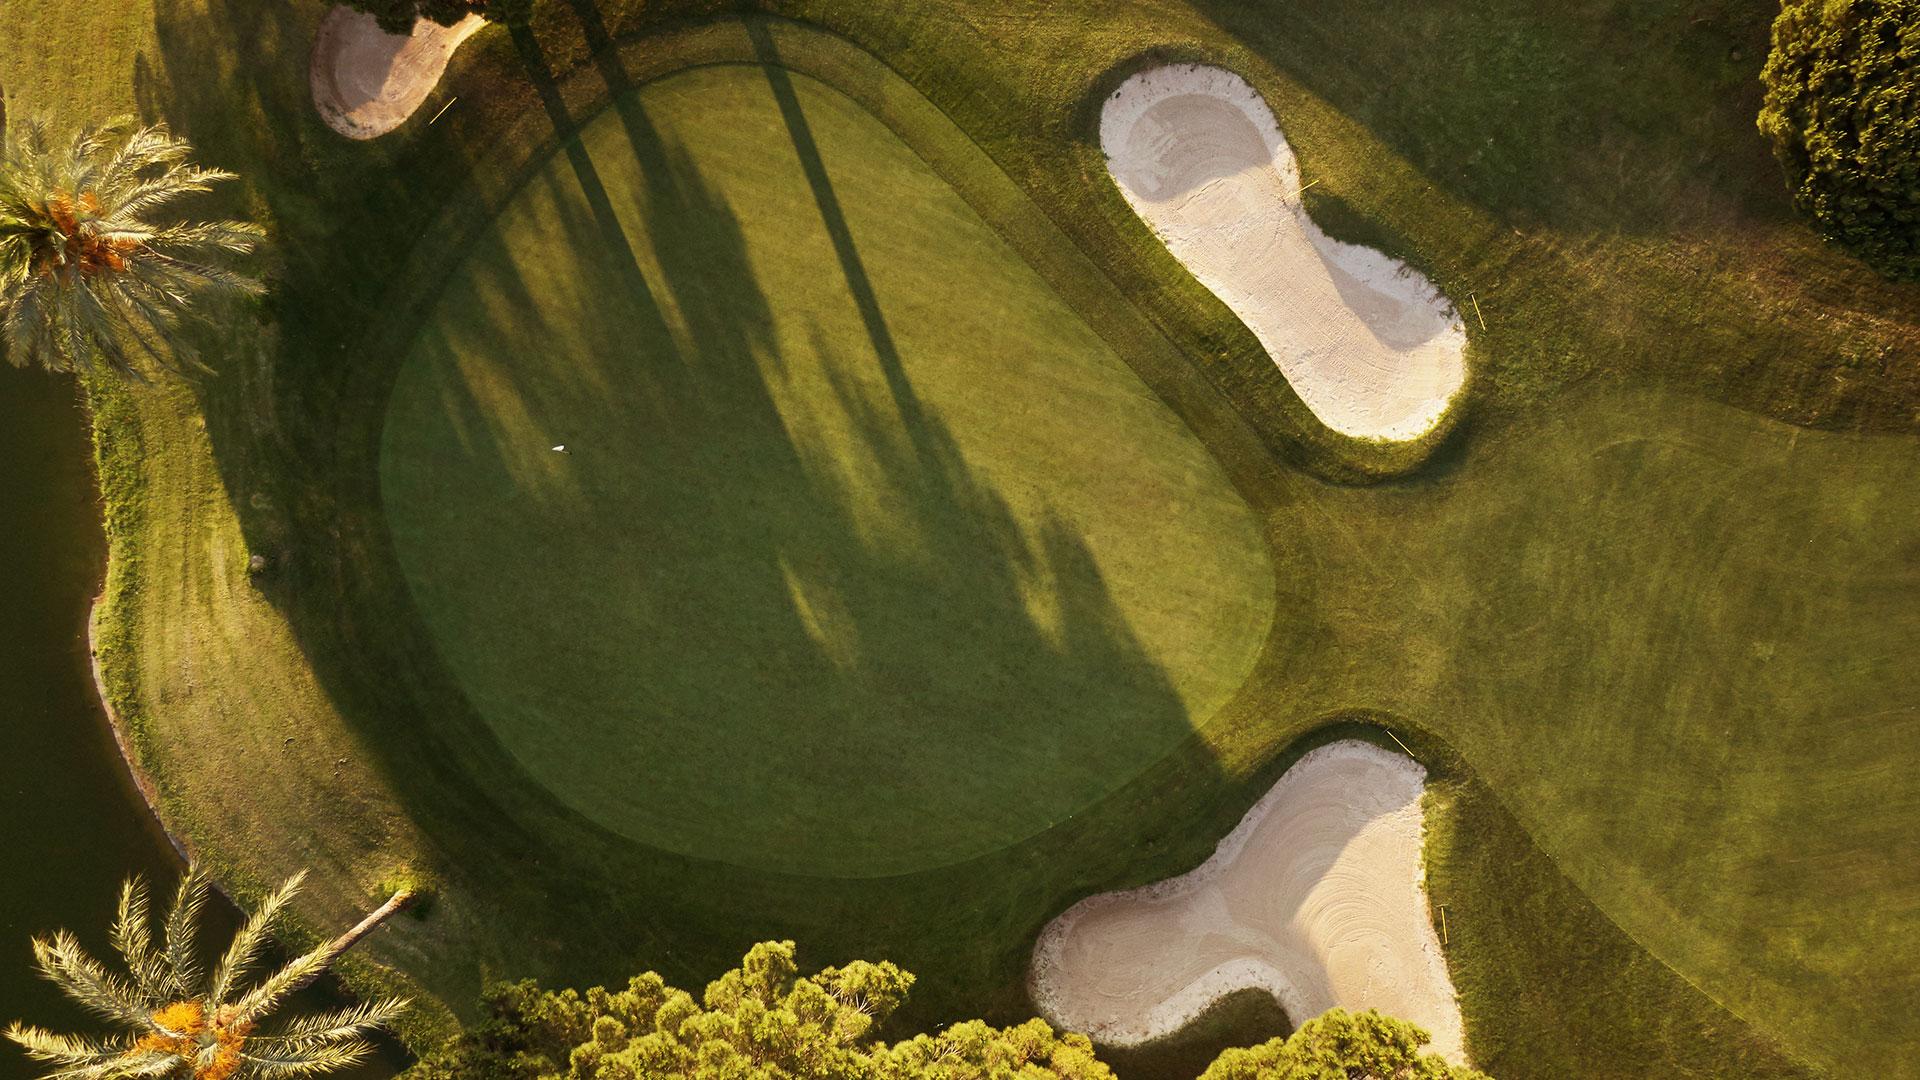 campo de golf llavaneras vista zenital bunker